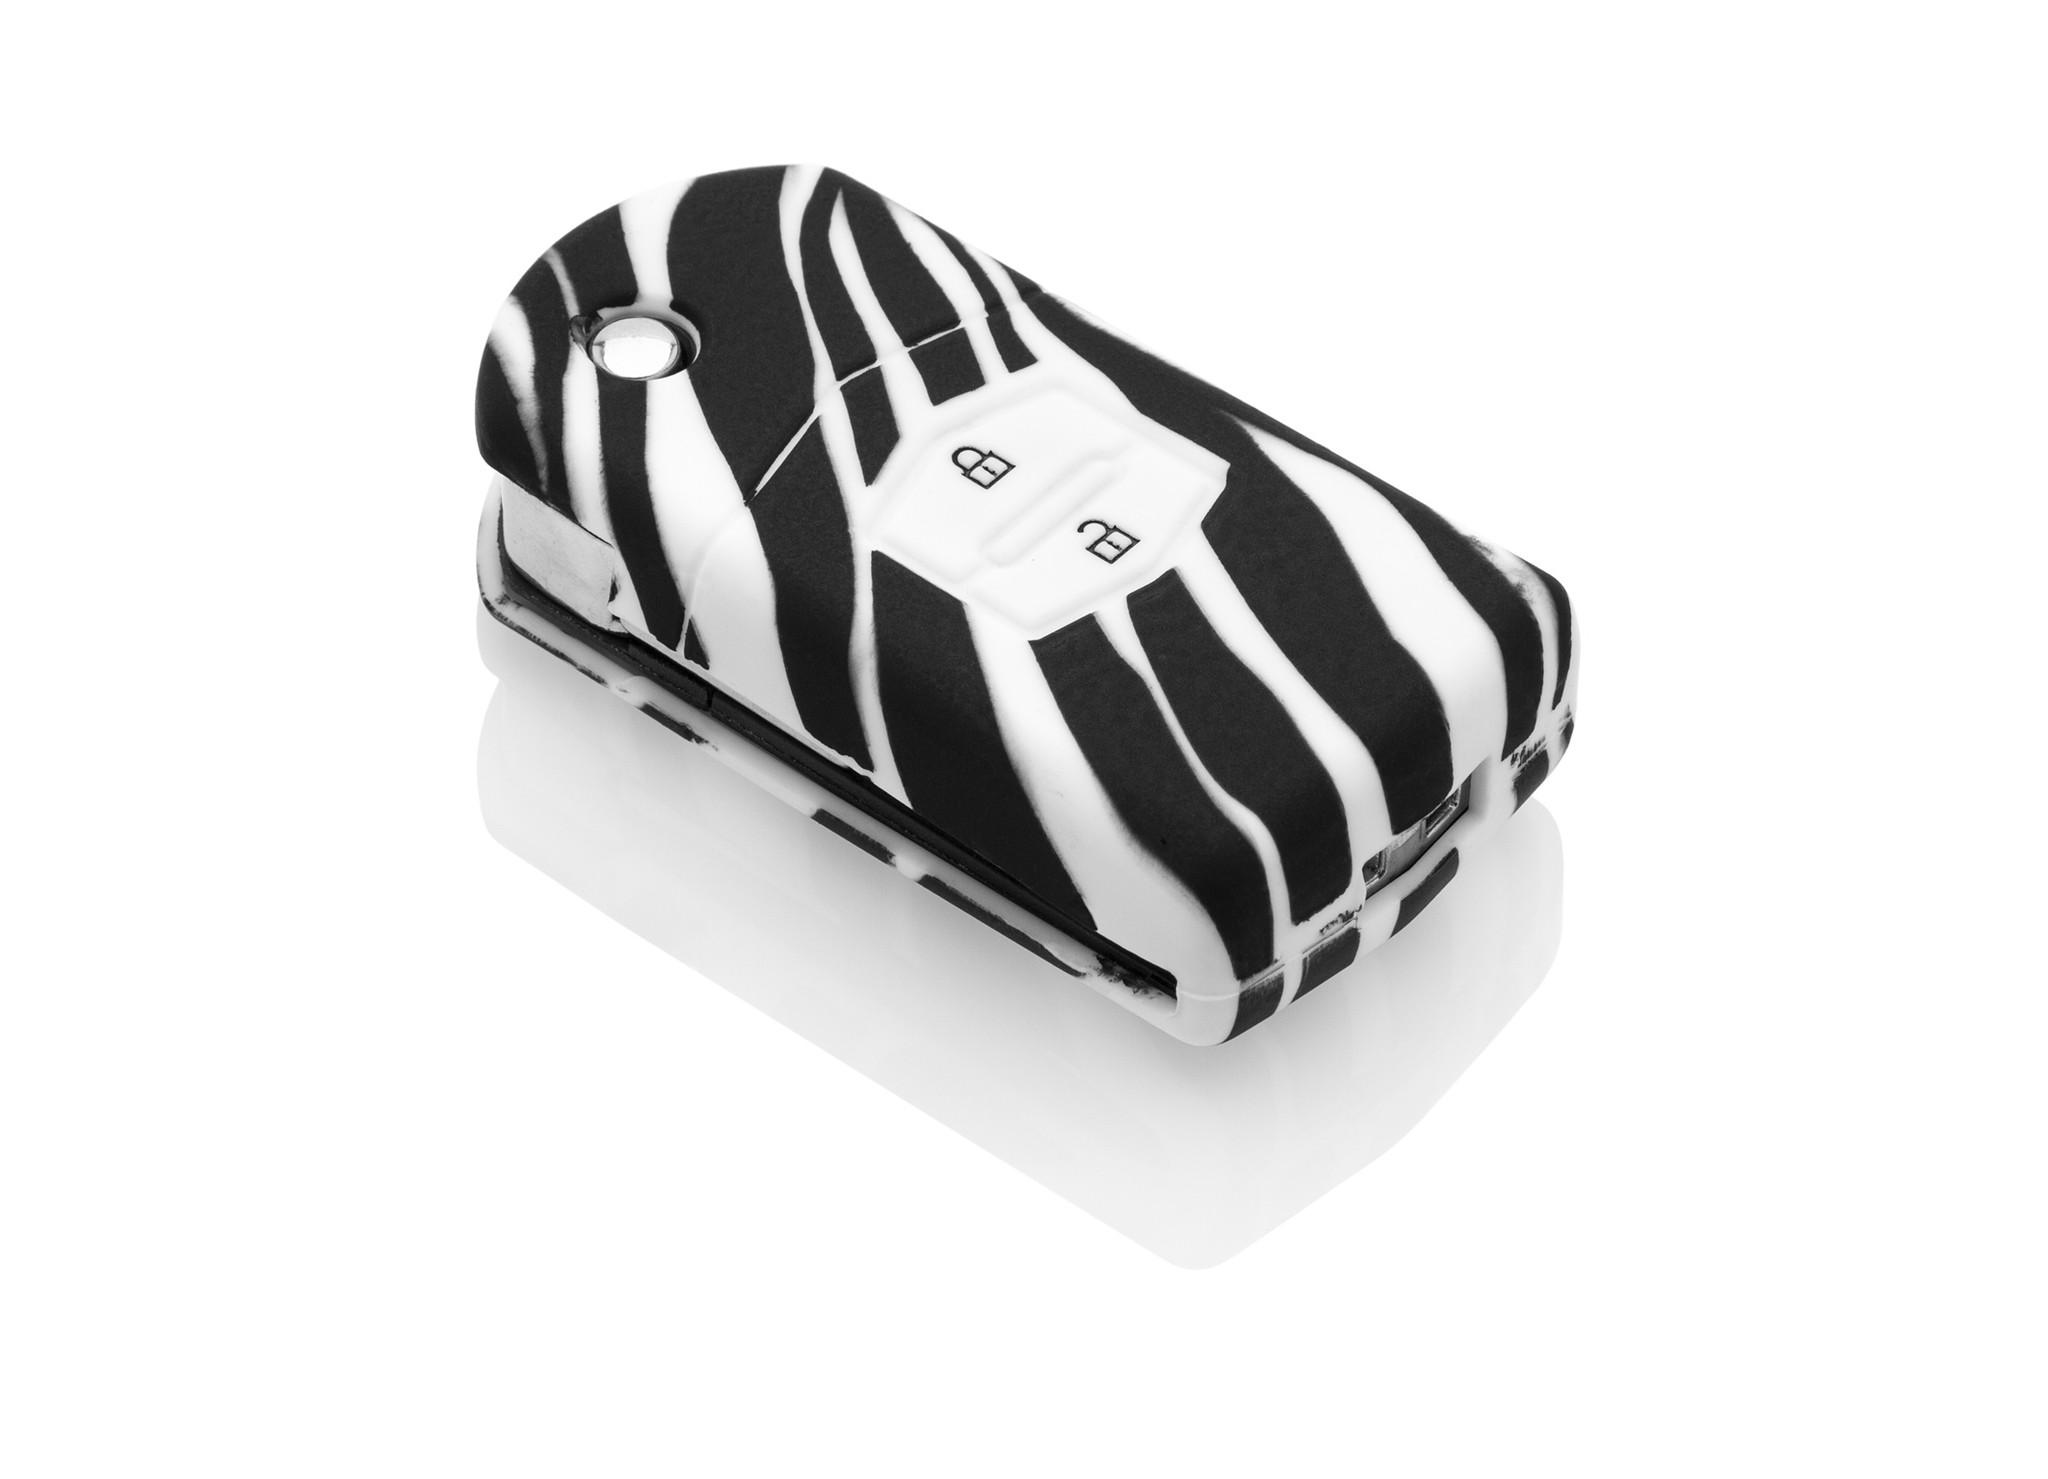 TBU car TBU car Sleutel cover compatibel met Mazda - Silicone sleutelhoesje - beschermhoesje autosleutel - Zebra